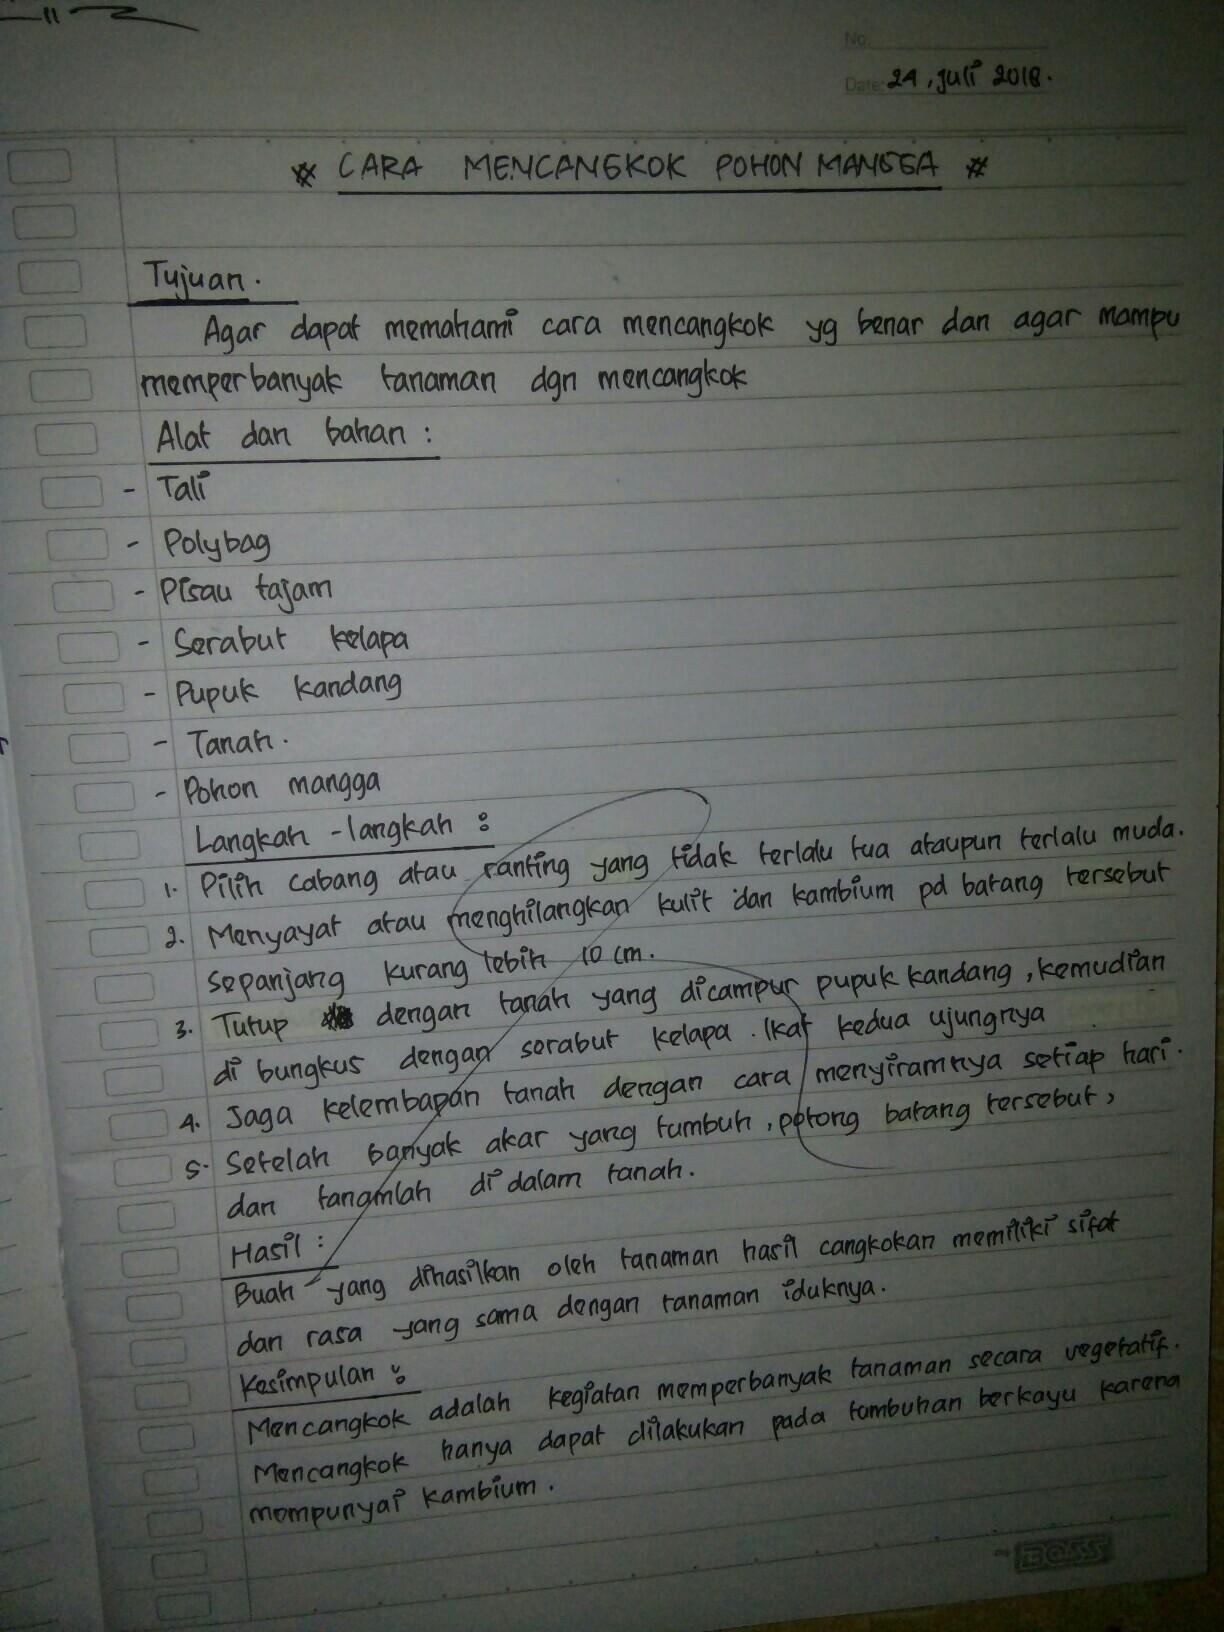 Contoh Laporan Teks Percobaan : contoh, laporan, percobaan, Berikan, Contoh, Laporan, PercobaanTolong, Bantu, Kak:), Brainly.co.id